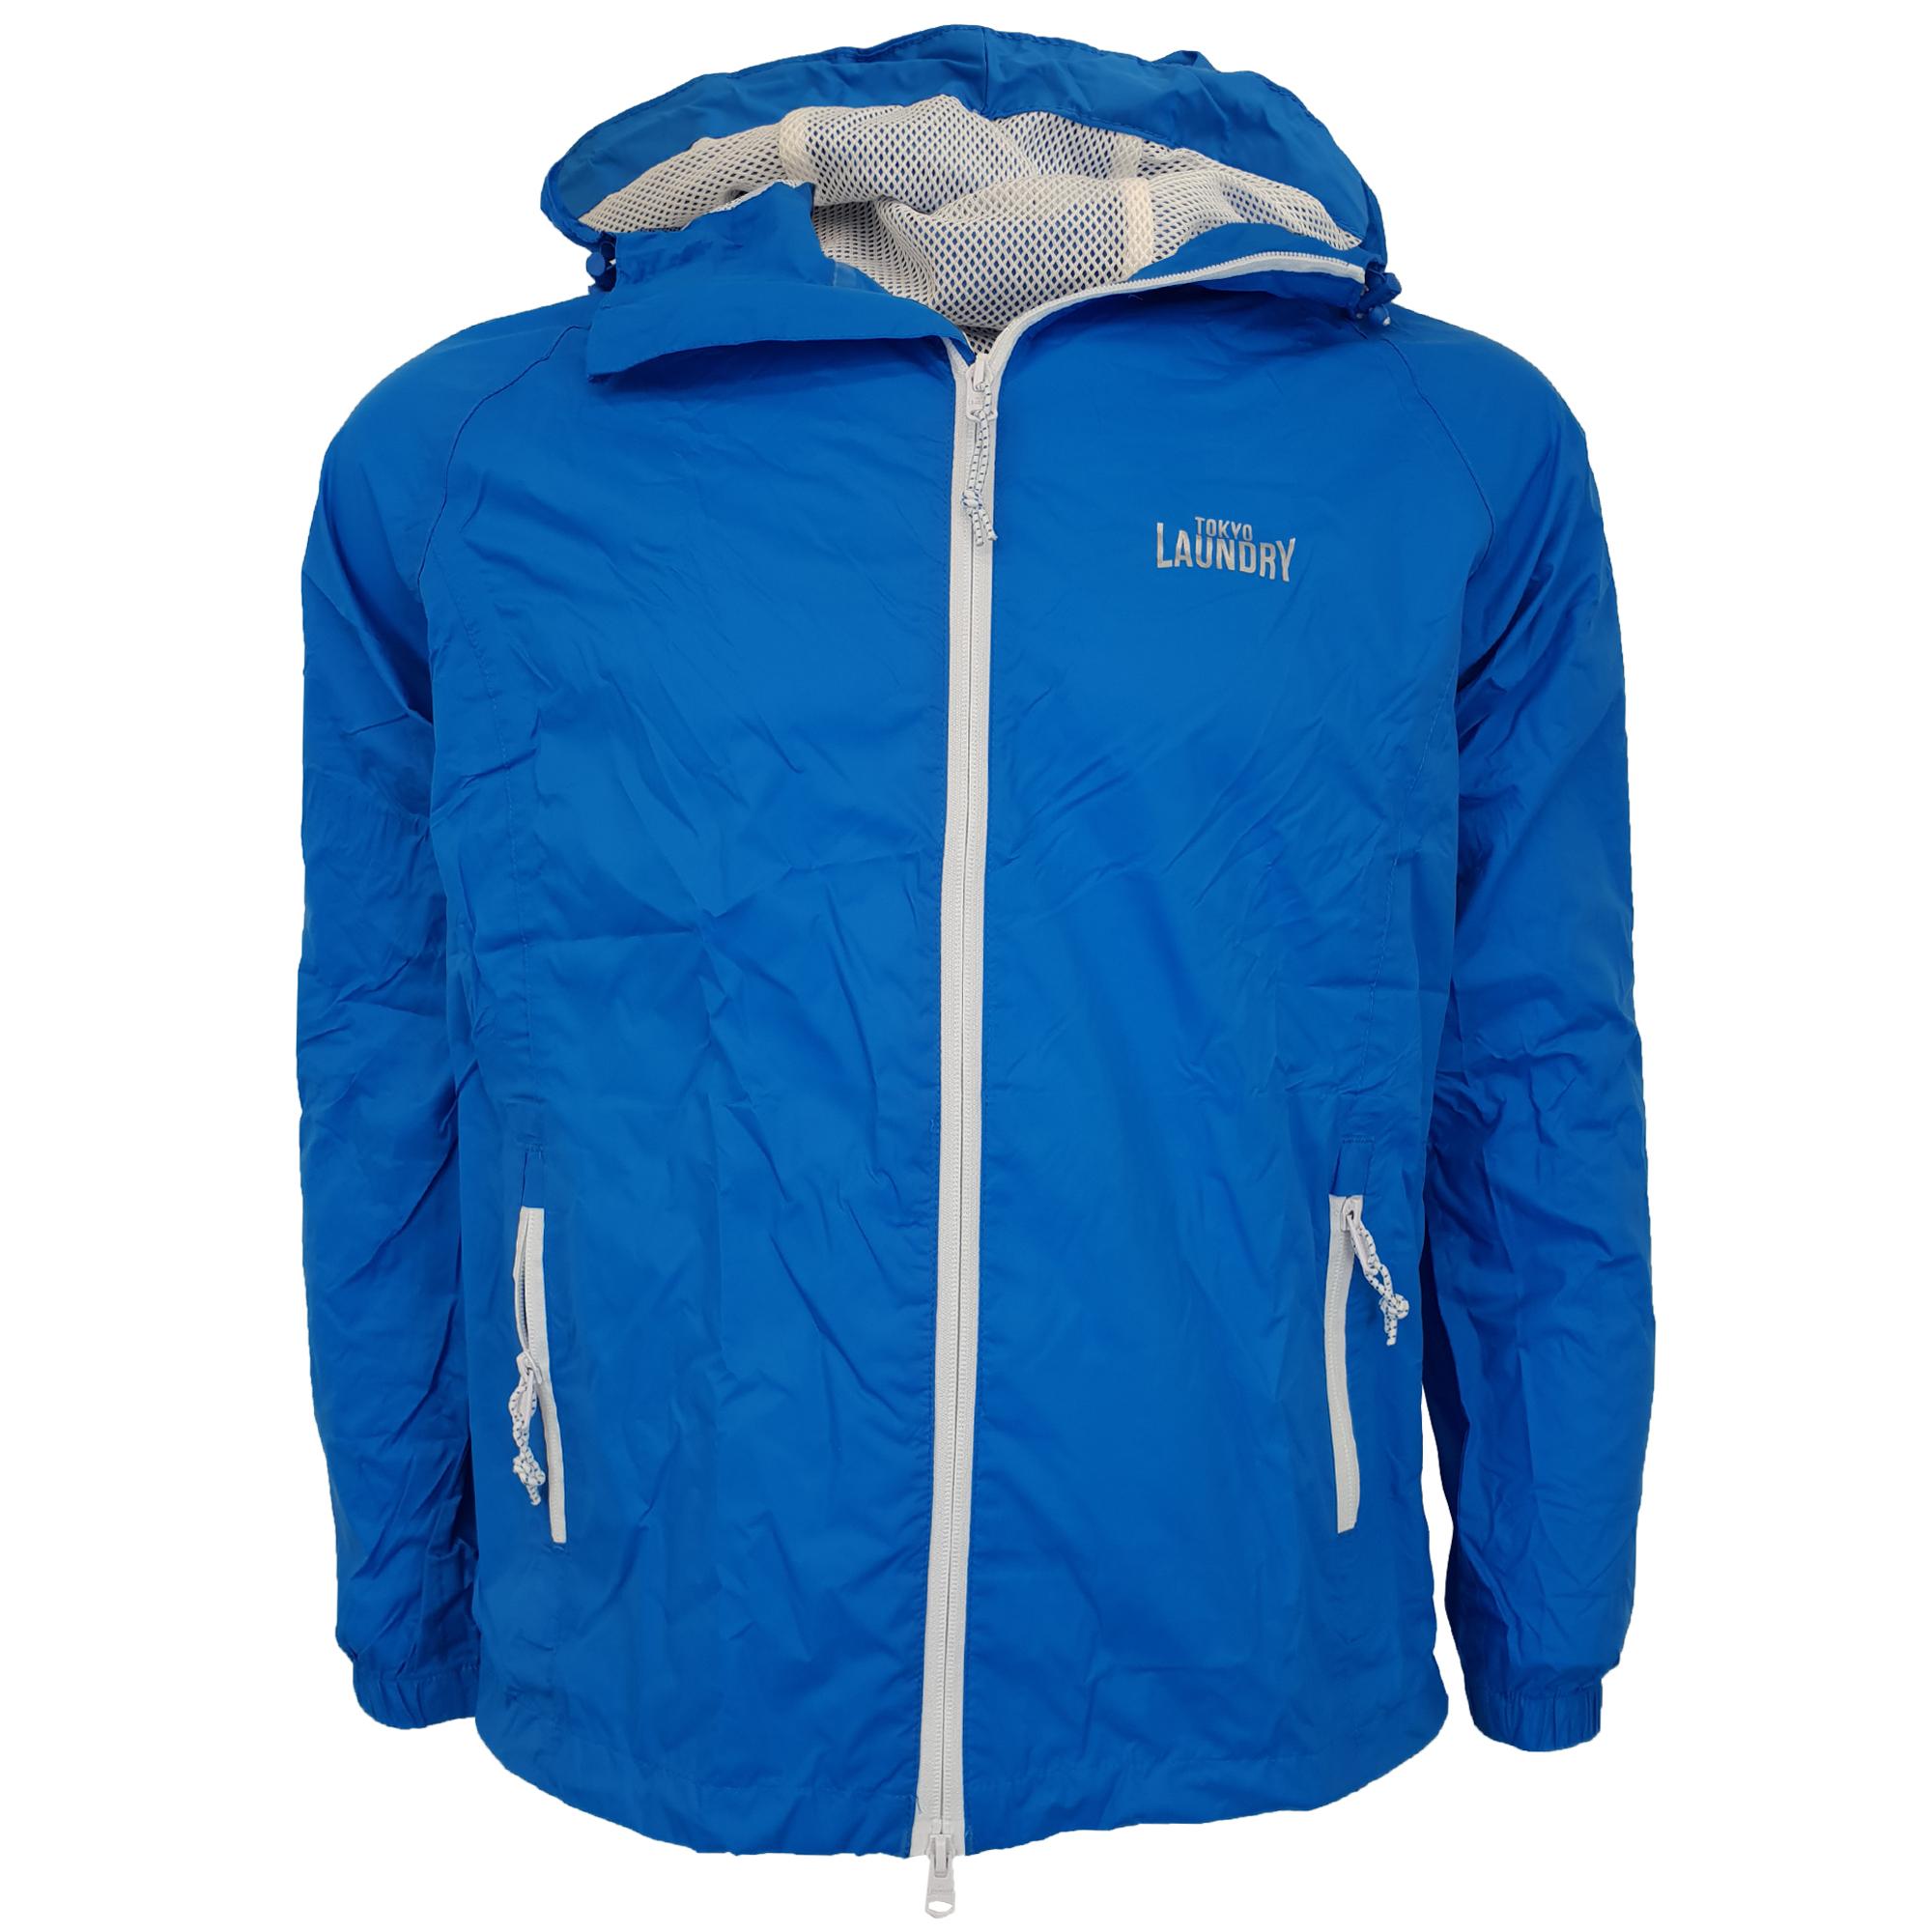 Mens-Kagool-Breathable-Hooded-Jacket-Tokyo-Laundry-Waterproof-Coat-Windproof-New thumbnail 5